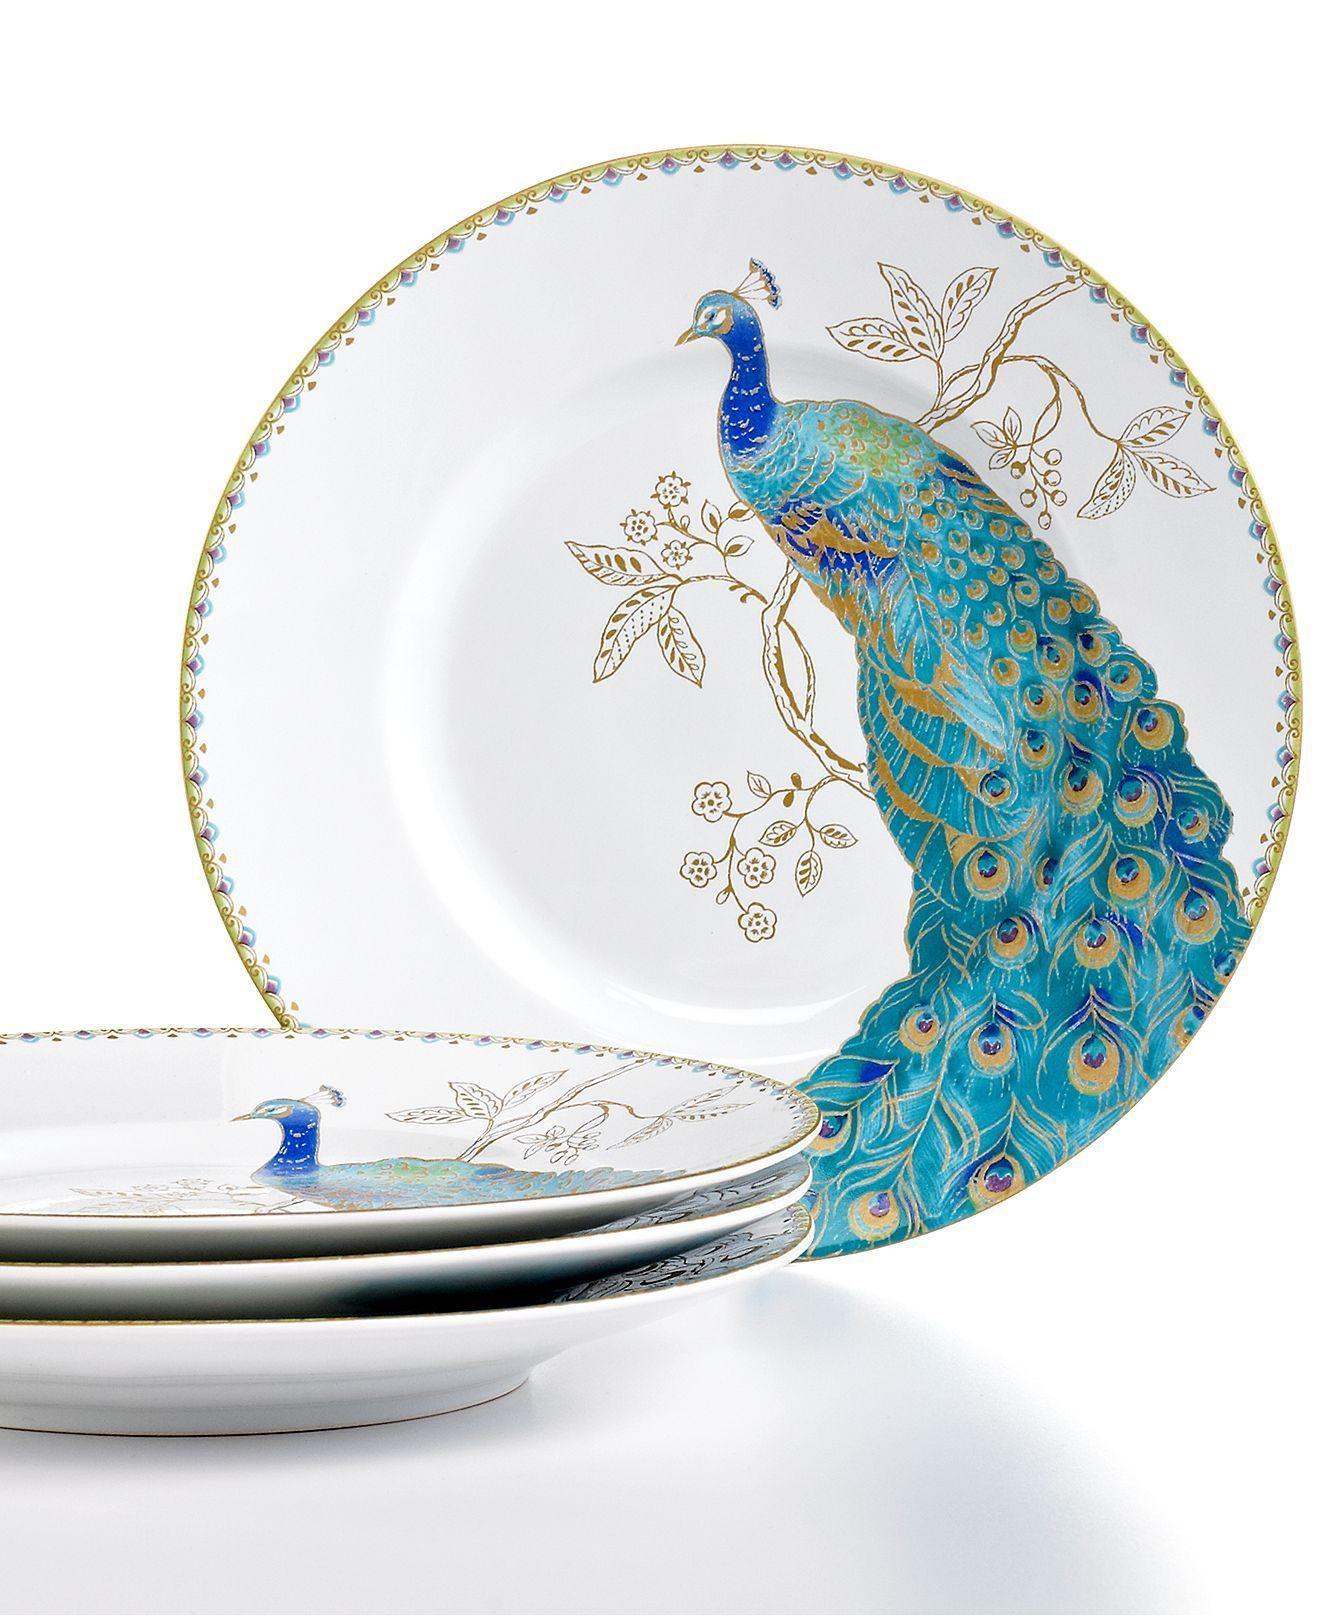 222 Fifth Dinnerware, Set of 4 Peacock Garden Salad Plates - Casual Dinnerware - Dining  Entertaining - Macy's #casualdinnerware 222 Fifth Dinnerware, Set of 4 Peacock Garden Salad Plates - Casual Dinnerware - Dining  Entertaining - Macy's #casualdinnerware 222 Fifth Dinnerware, Set of 4 Peacock Garden Salad Plates - Casual Dinnerware - Dining  Entertaining - Macy's #casualdinnerware 222 Fifth Dinnerware, Set of 4 Peacock Garden Salad Plates - Casual Dinnerware - Dining  Entertaining - Macy's #casualdinnerware